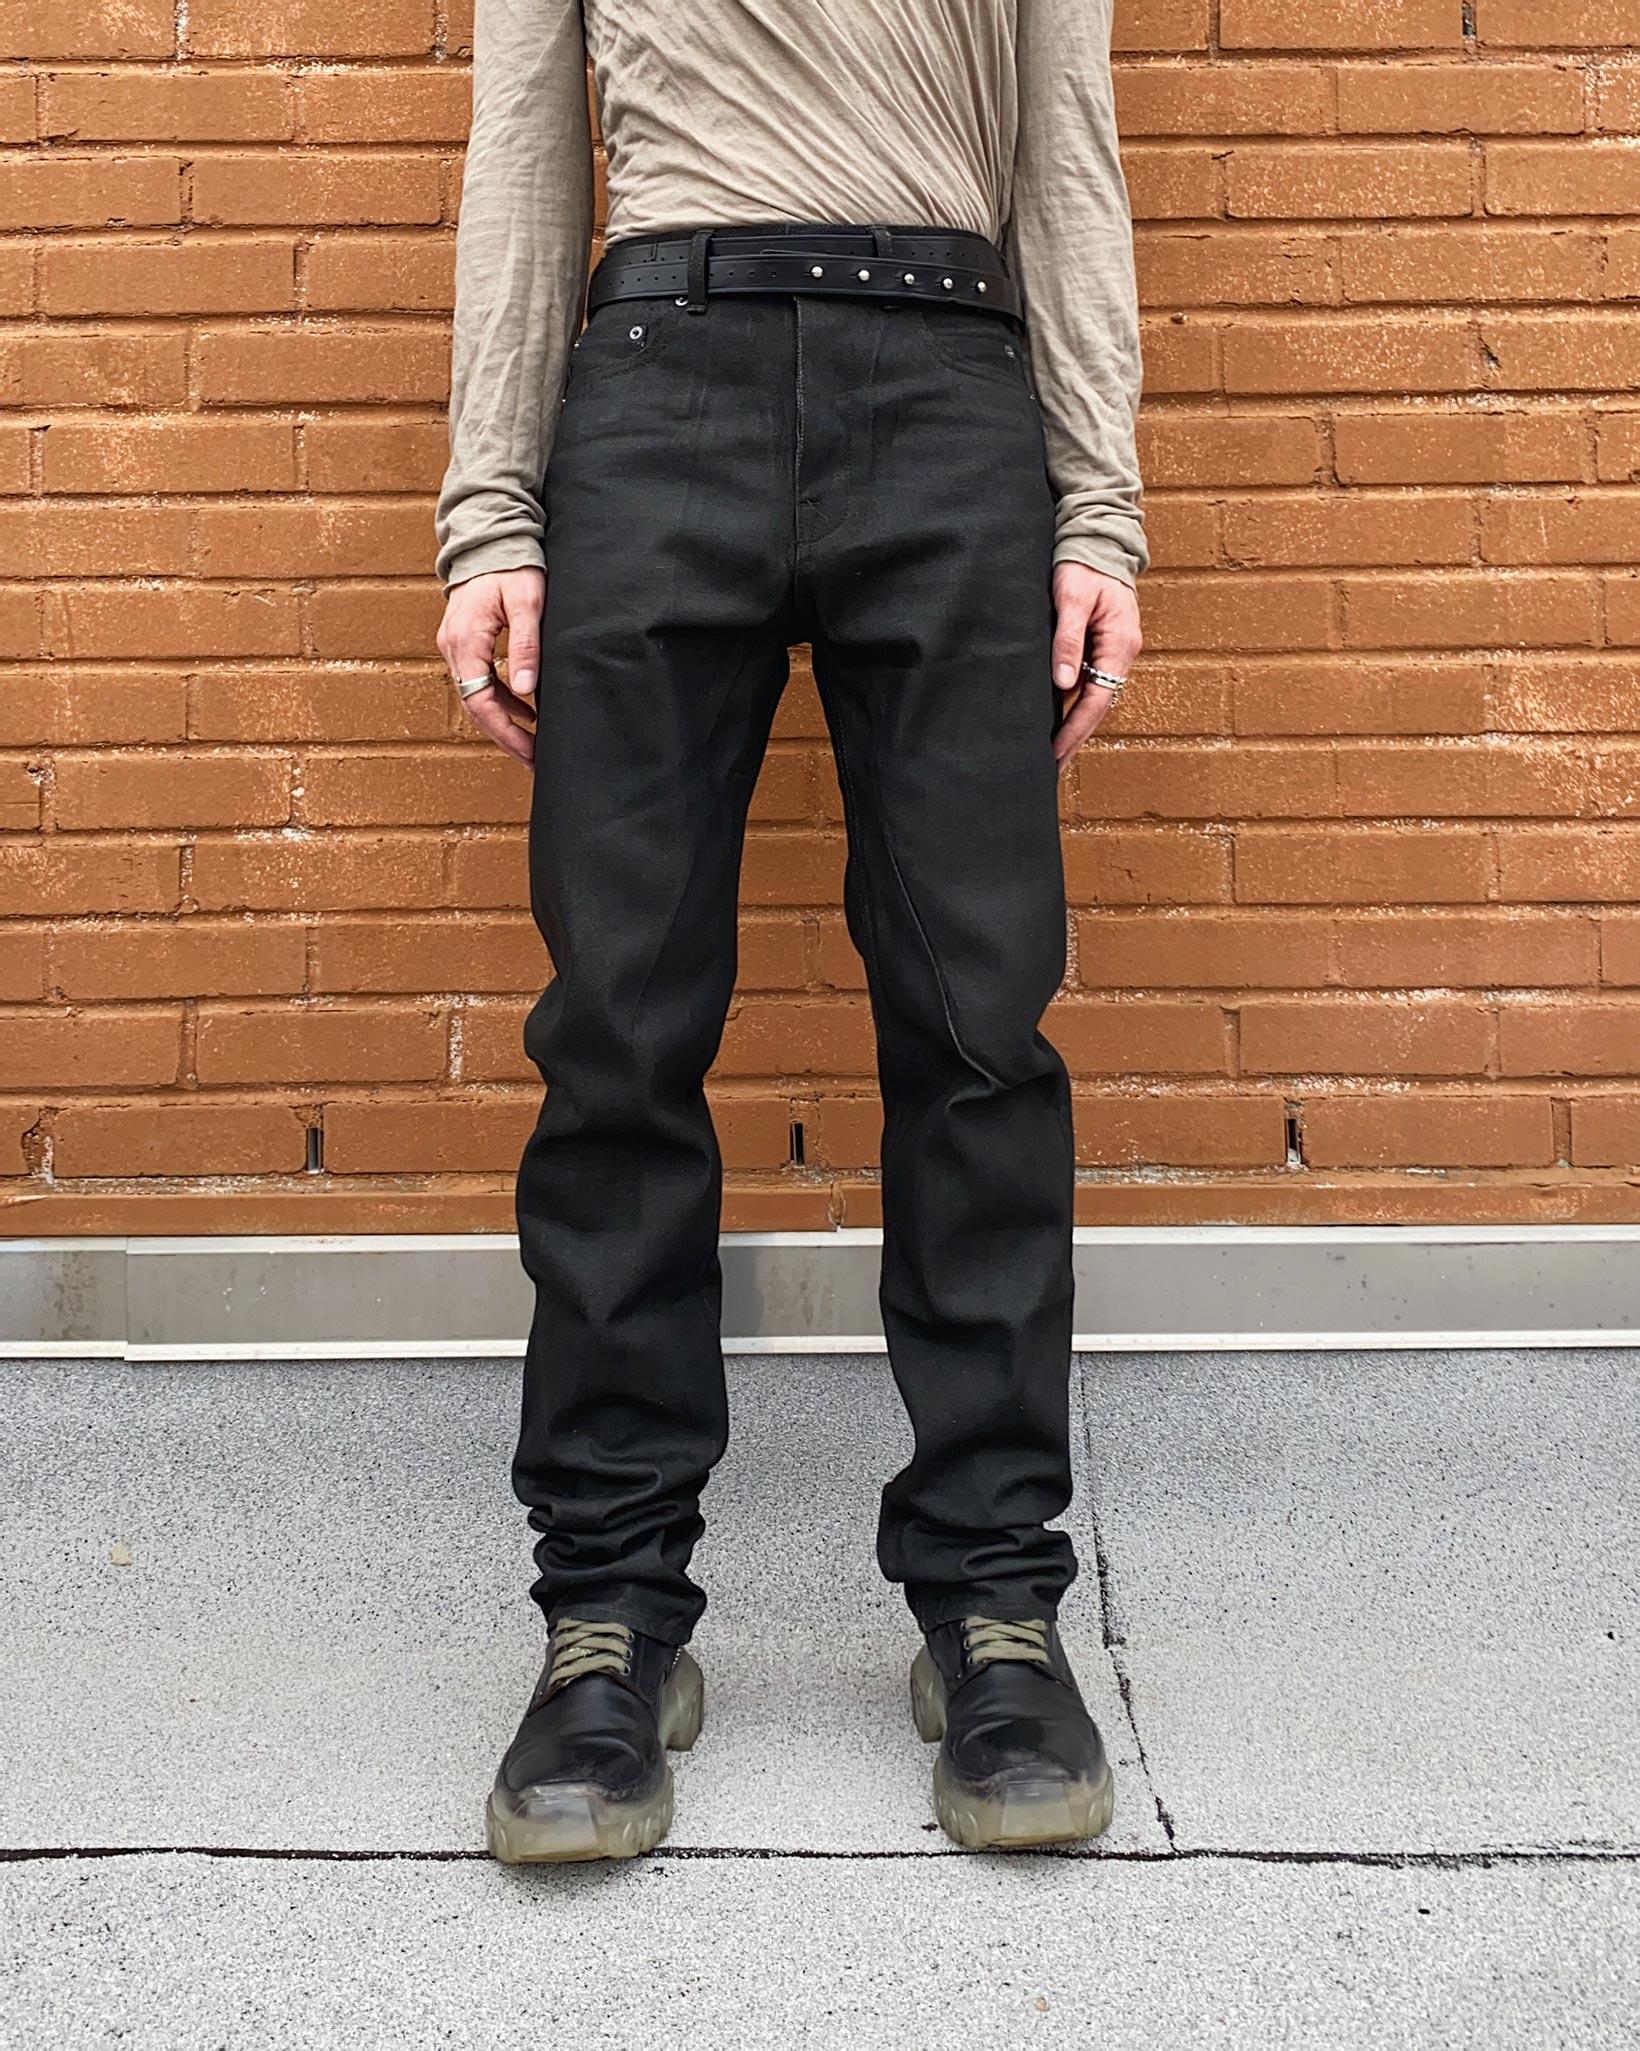 Rick Owens DRKSHDW Detroit Jeans - Made In Japan Black Waxed - Image 16